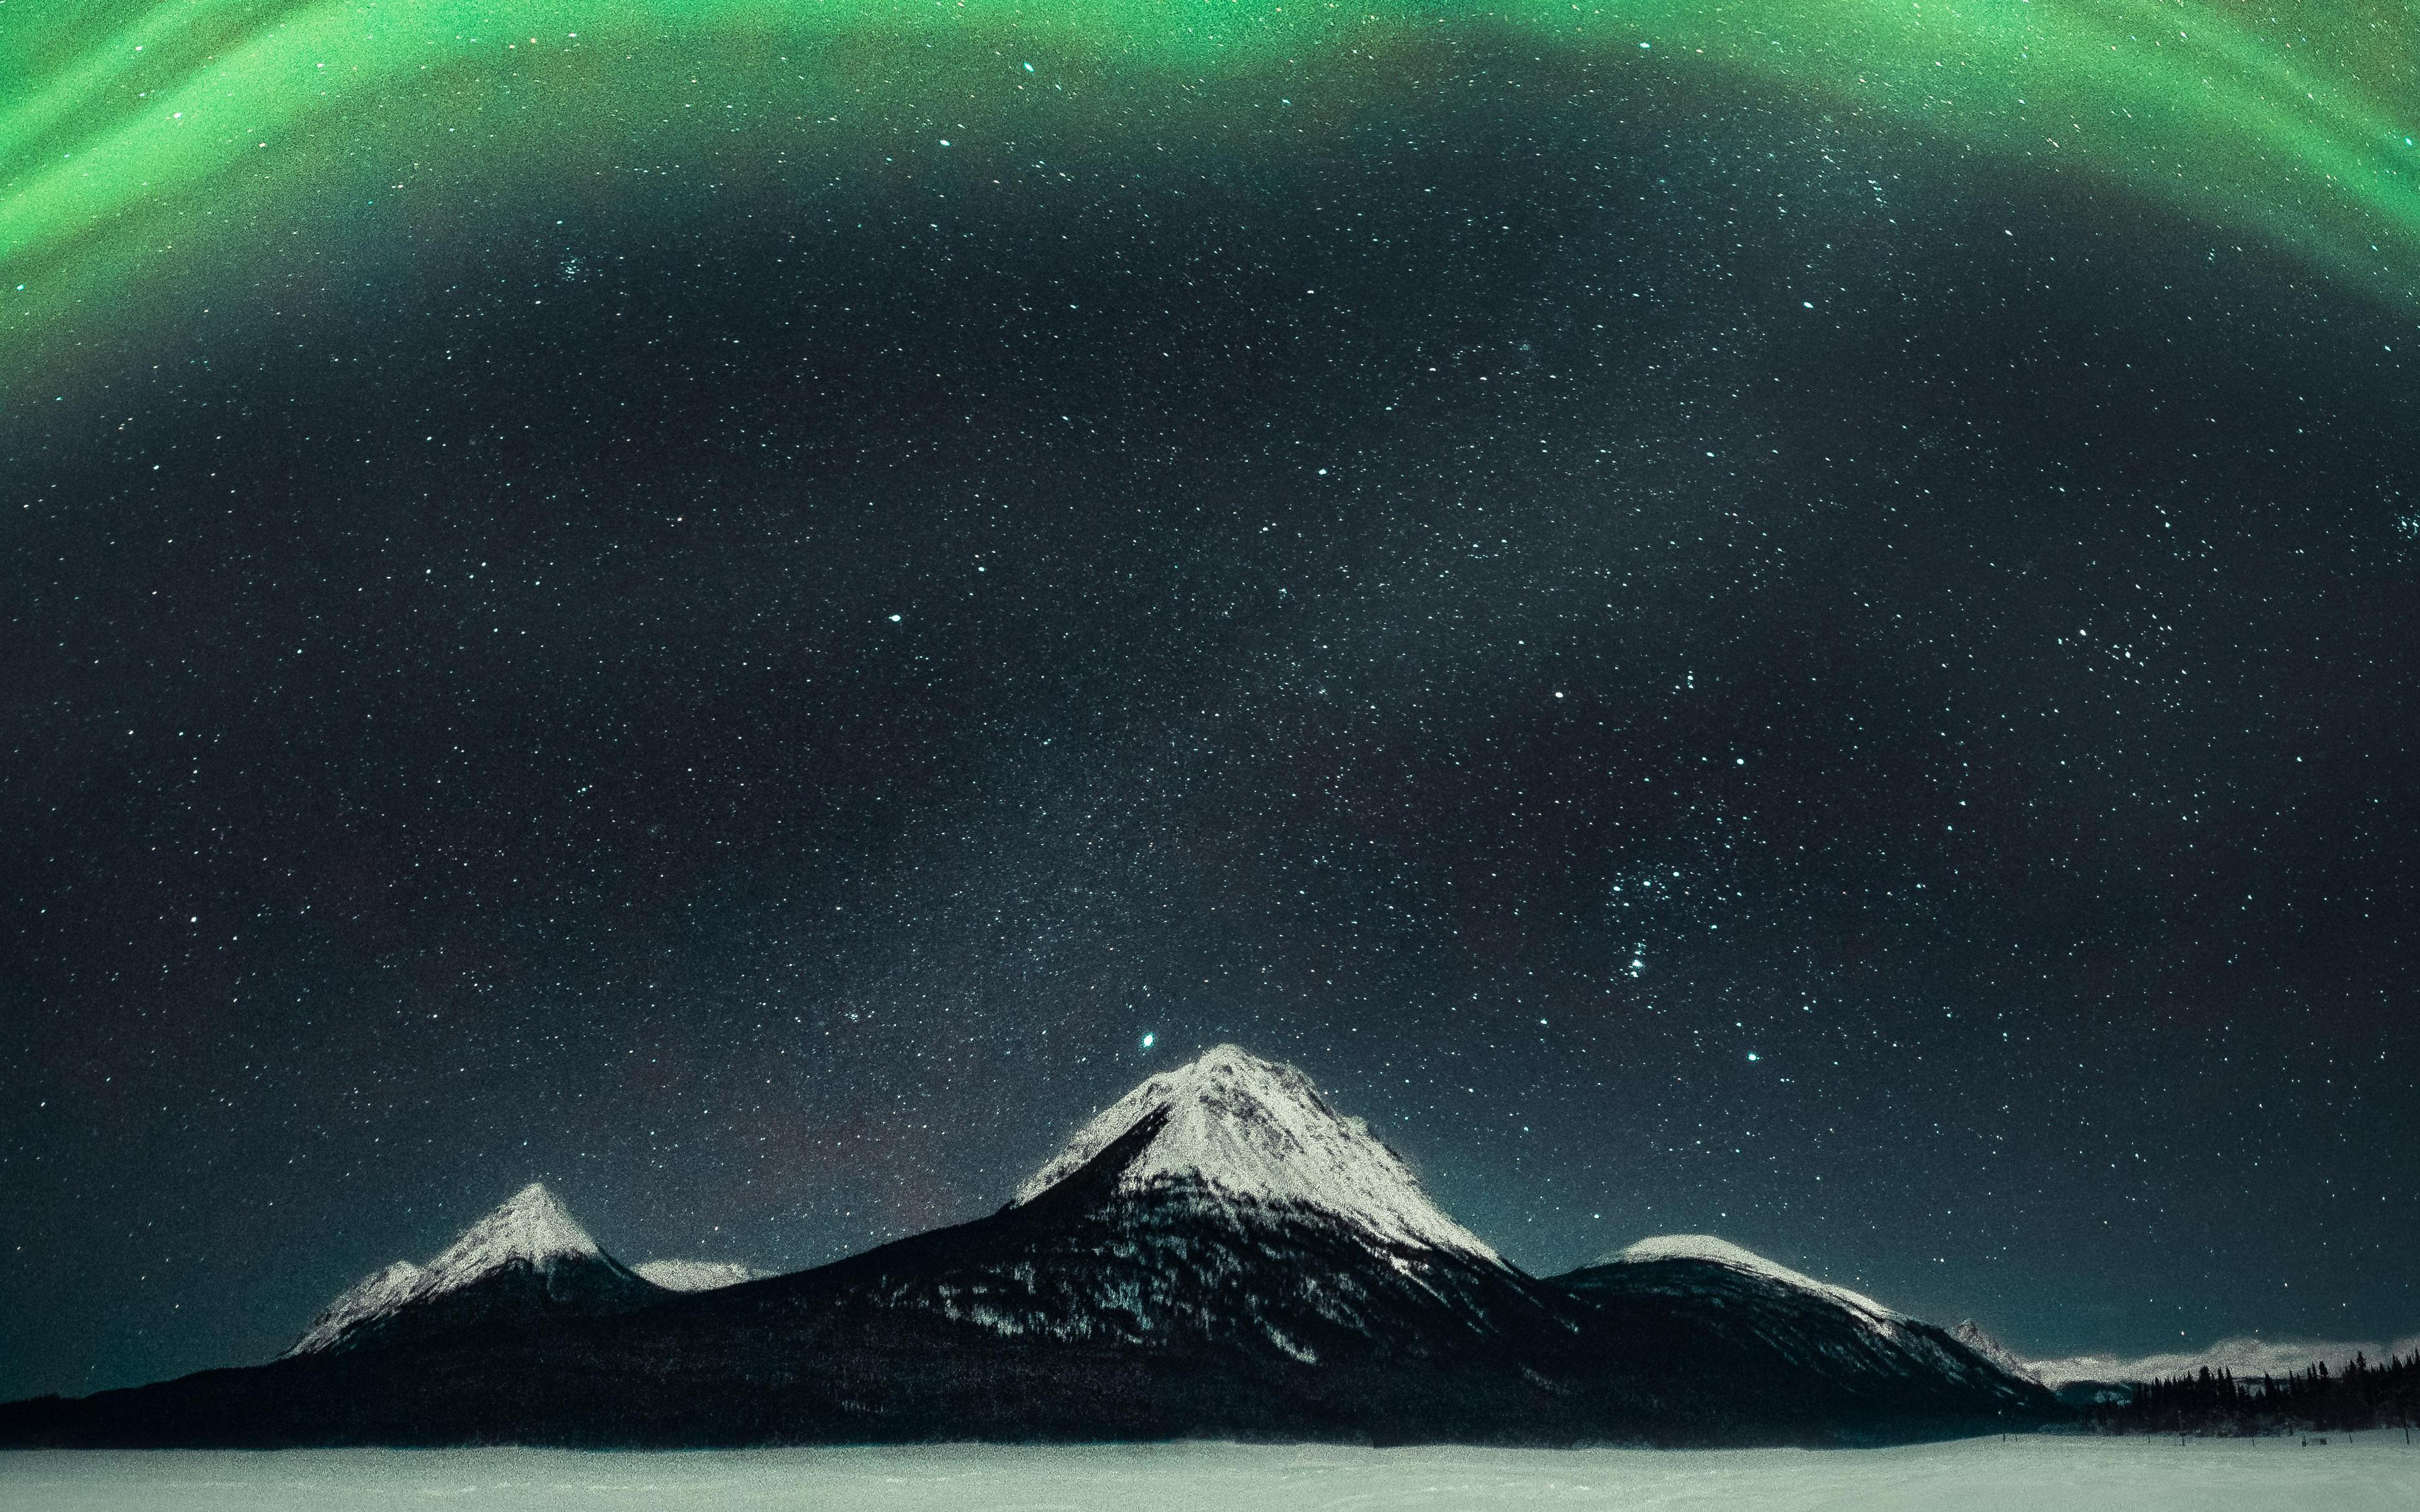 northern-lights-over-mountain-5k-vq.jpg